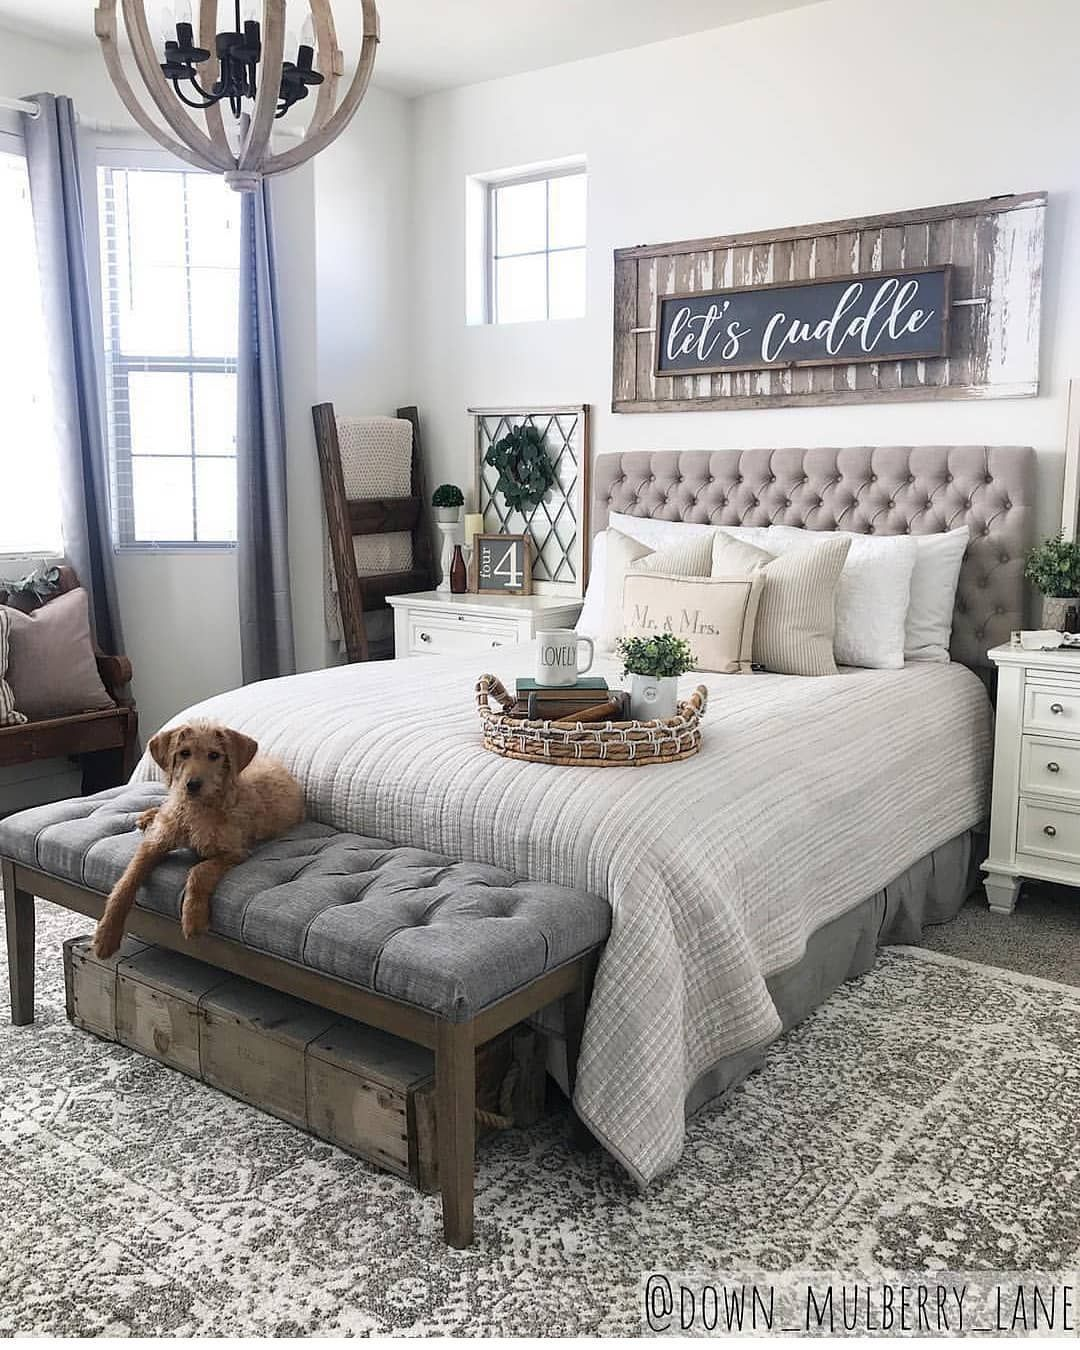 Master Bedroom Decorating Ideas To Inspire Your Next Remodel Master Bedrooms Decor Beautiful Bedrooms Master Modern Bedroom